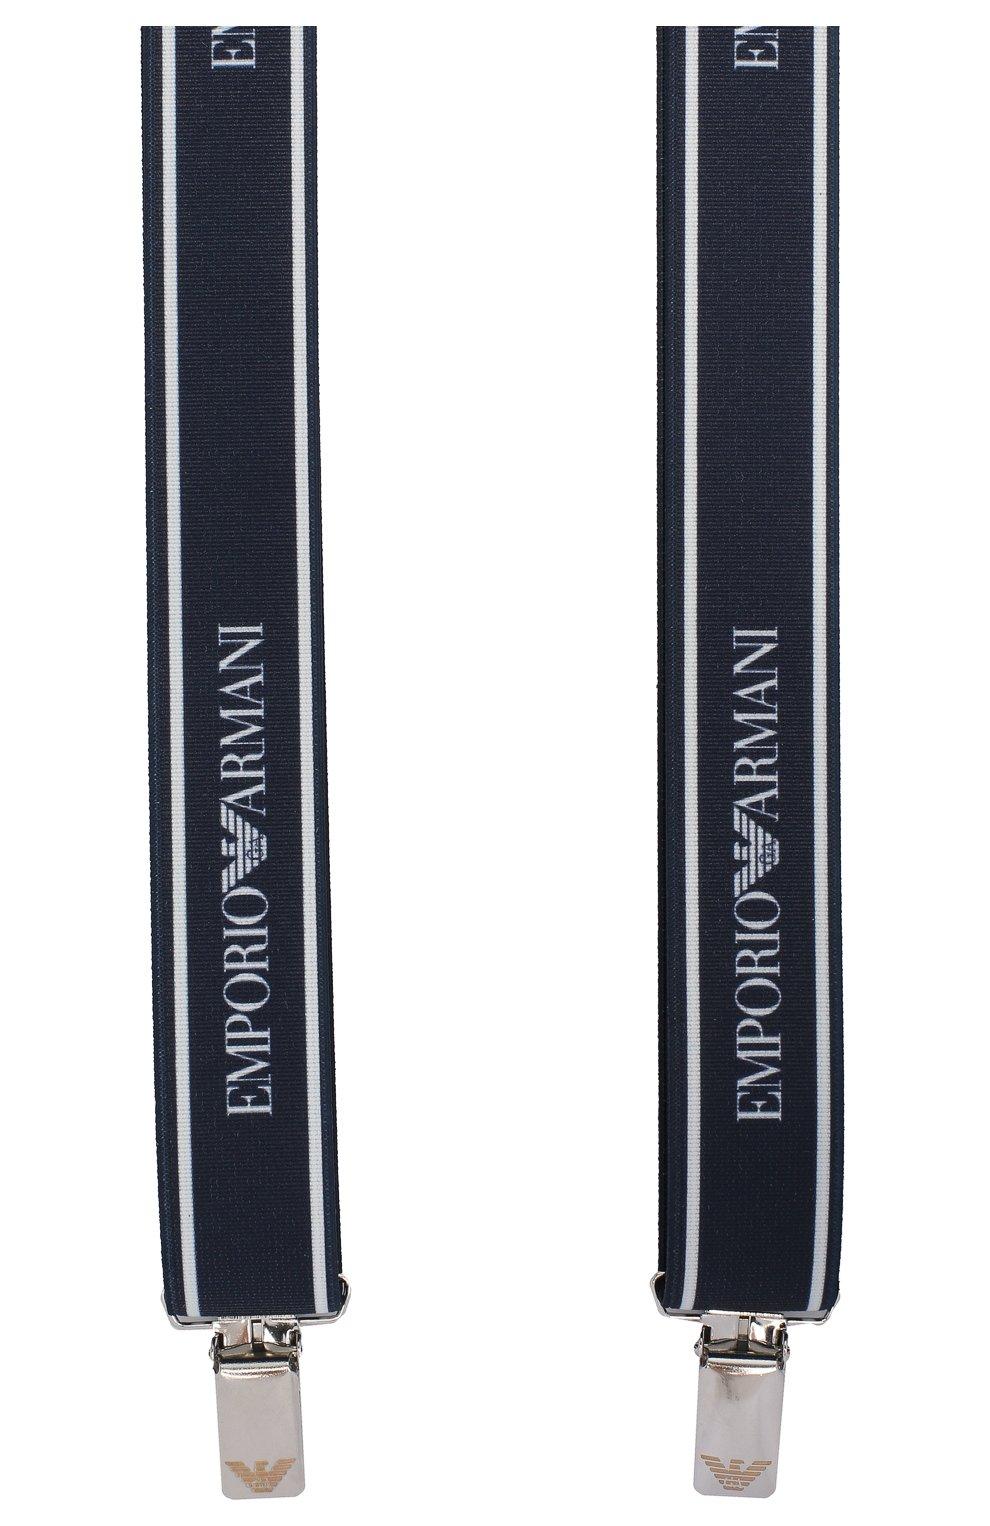 Детские подтяжки EMPORIO ARMANI темно-синего цвета, арт. 401524/9A581 | Фото 2 (Материал: Текстиль; Статус проверки: Проверено)